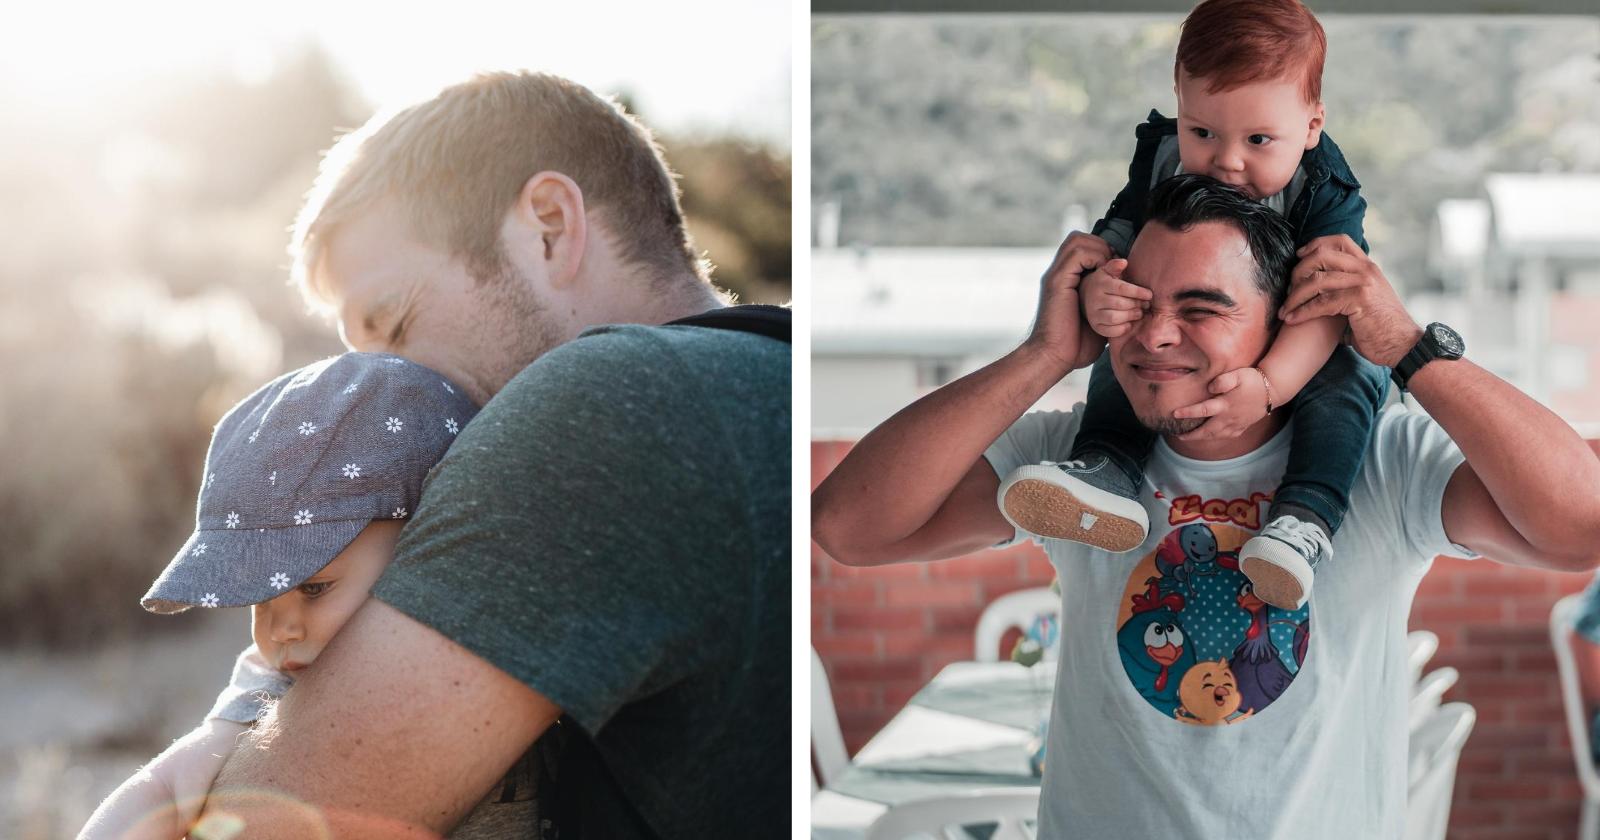 Festa na Caixa Dia dos Pais: 6 ideiais legais para presentear o seu coroa!